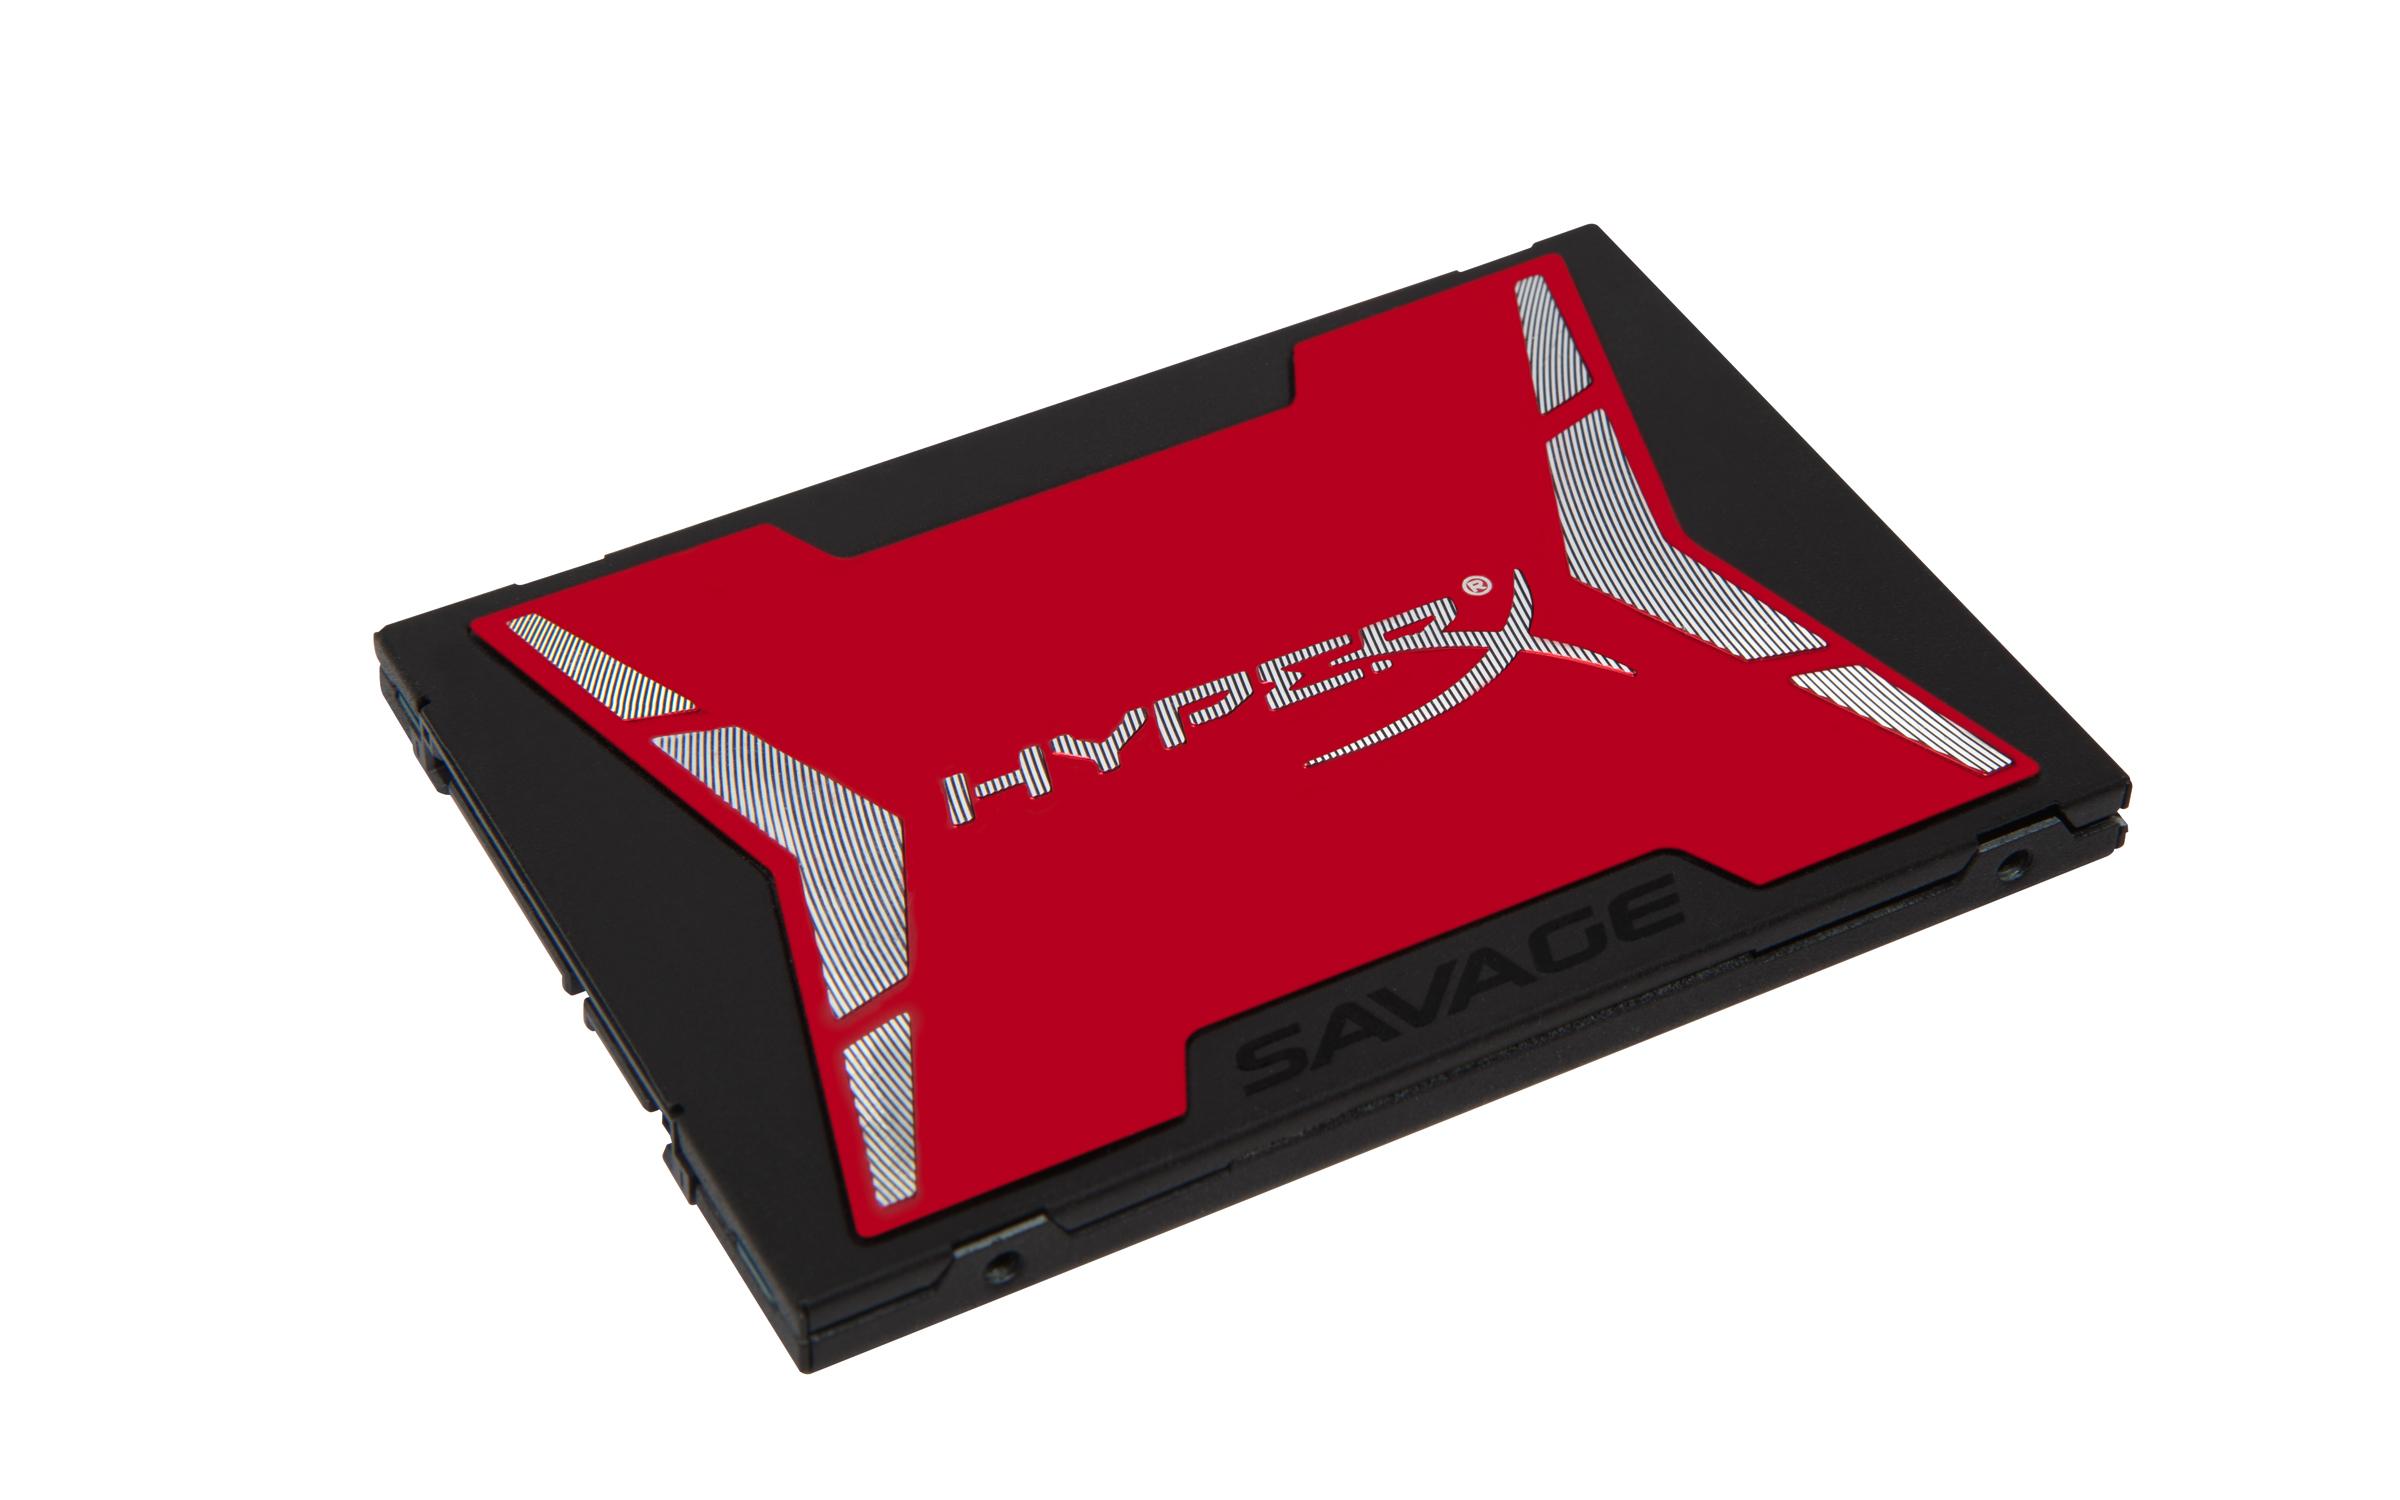 Kingston SSD HYPERX SAVAGE 240GB / 2.5